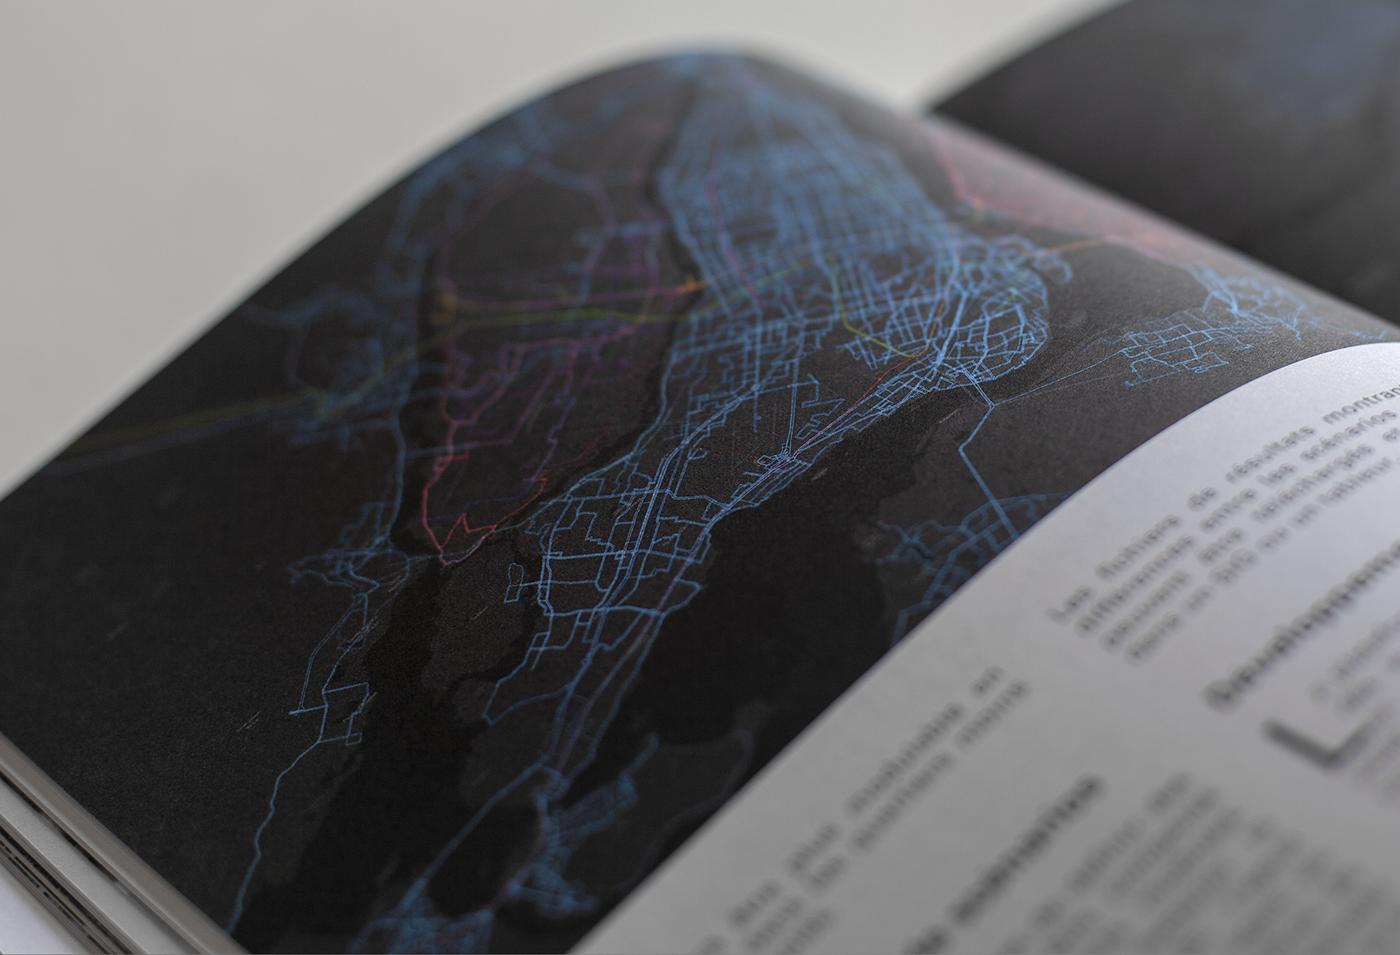 Transport infrastructures architecture magazine Montreal Quebec trasportation asymptote maps roads